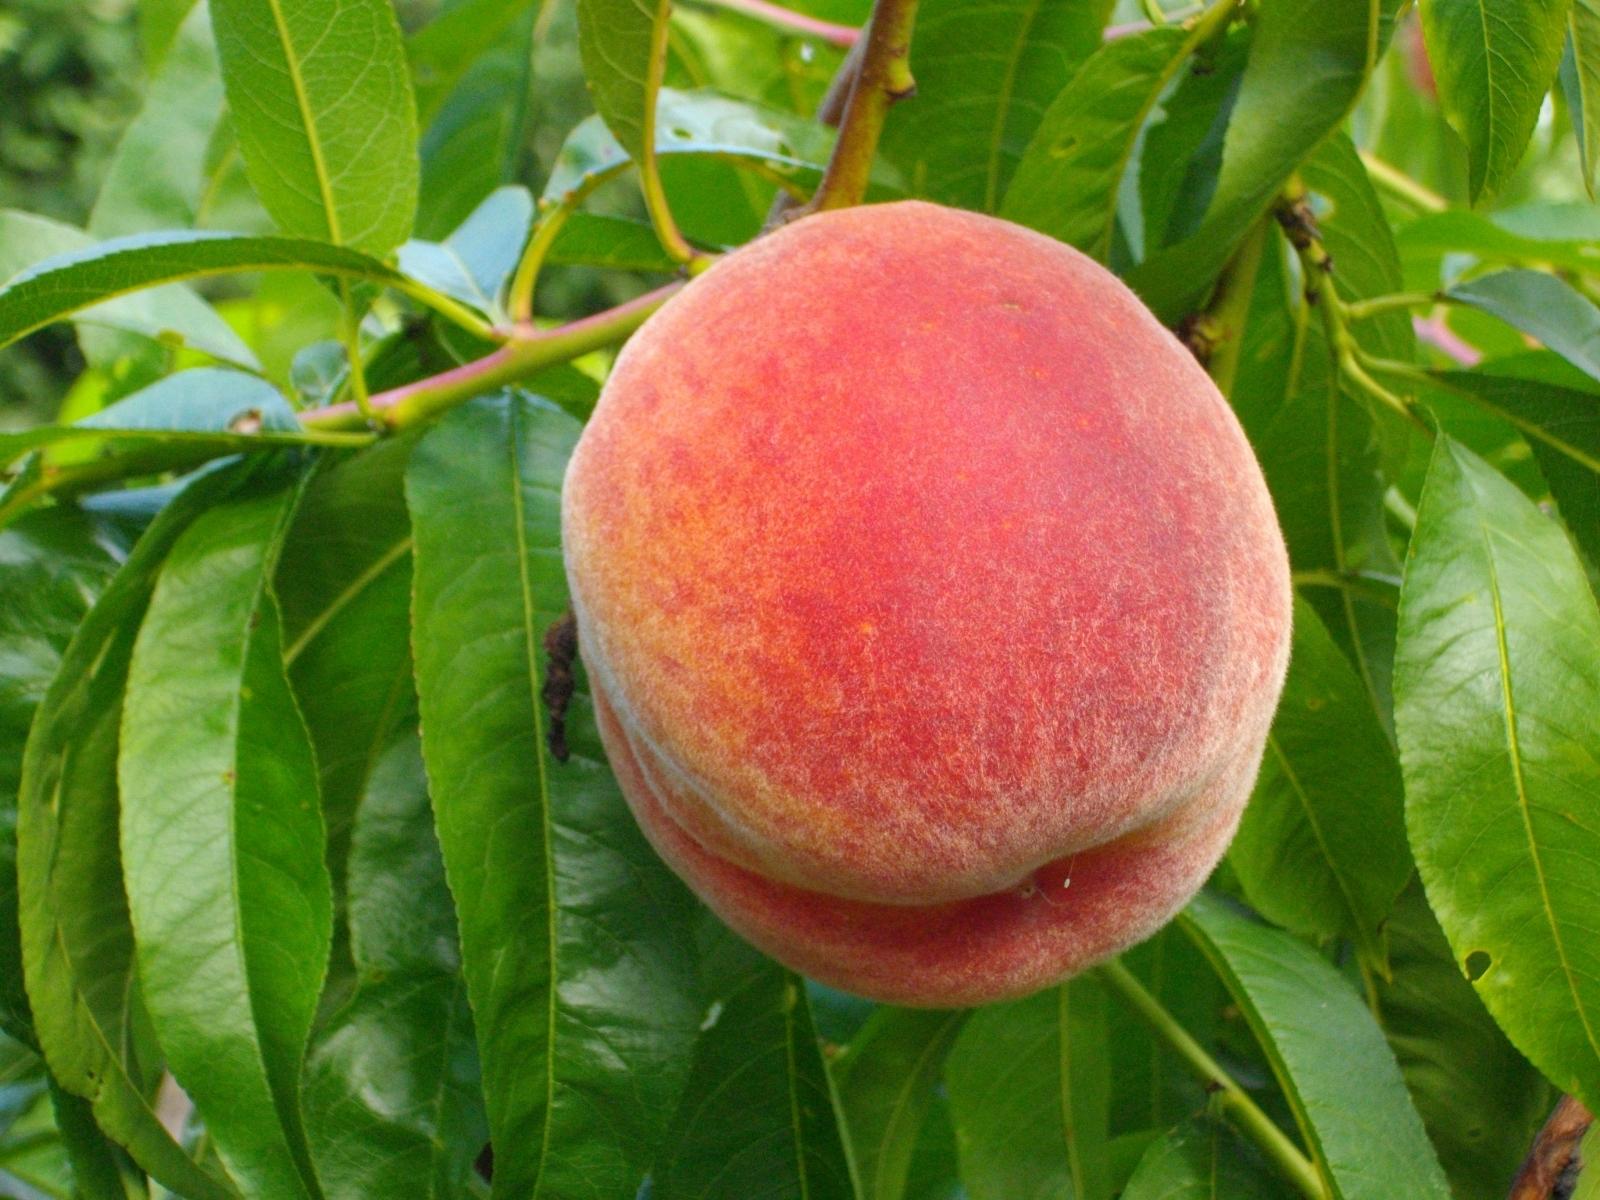 A peach on a tree